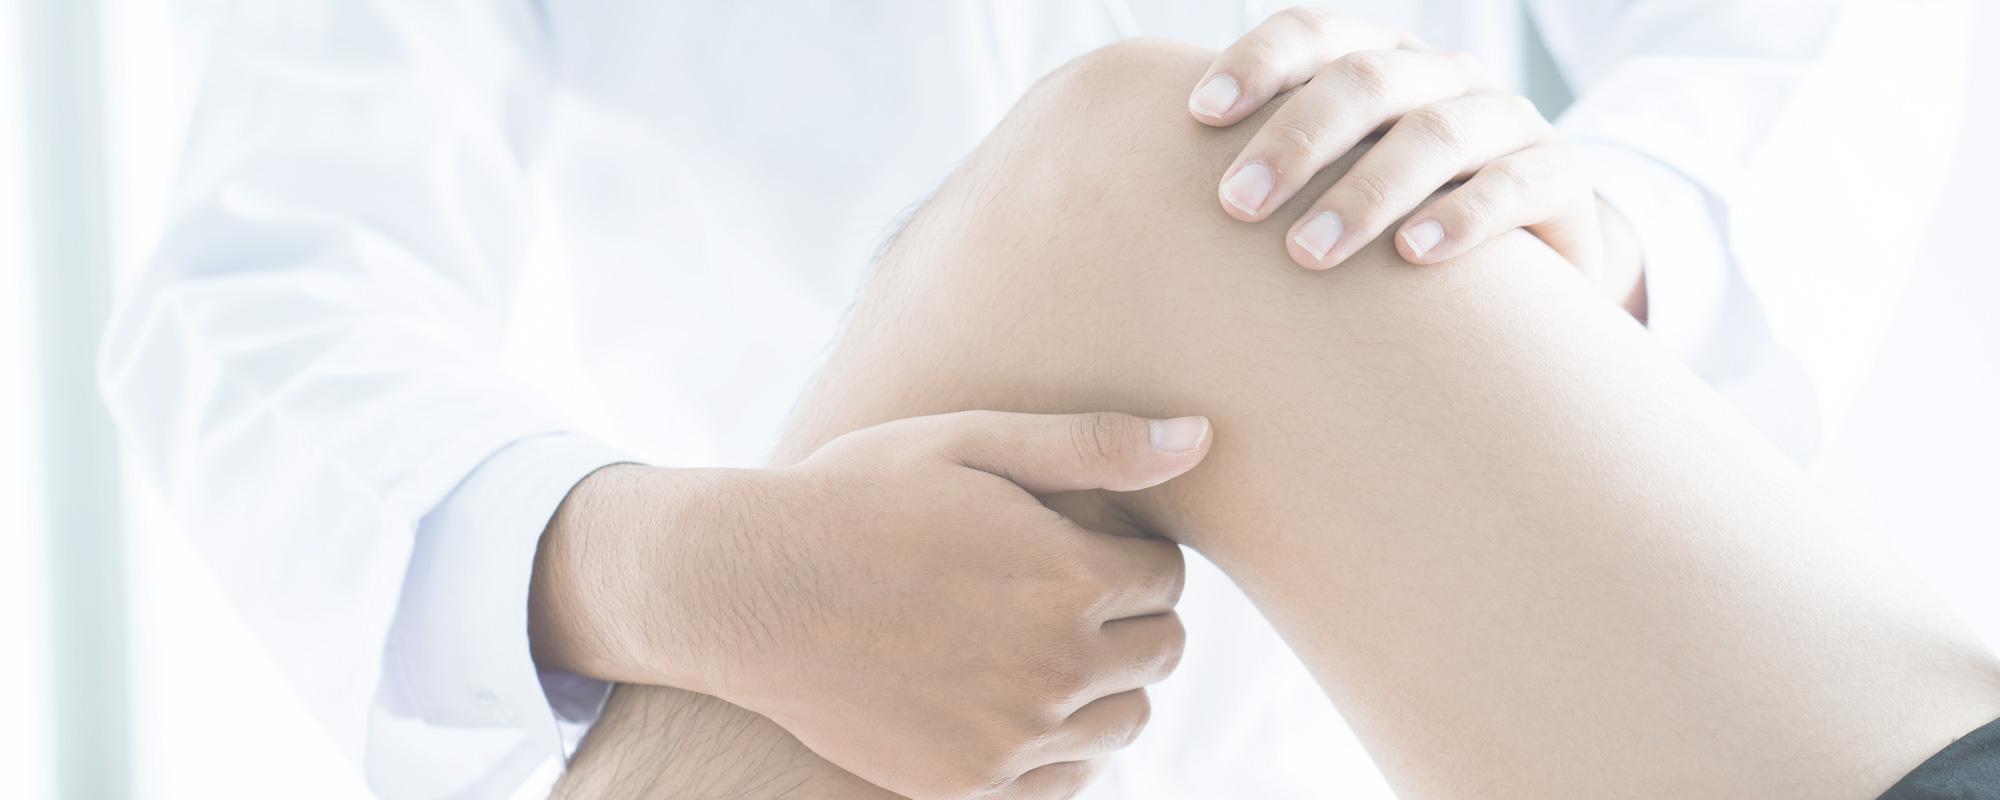 Arthroskopien der Gelenke, Knorpel-Behandlung, Orthopäde Mallorca